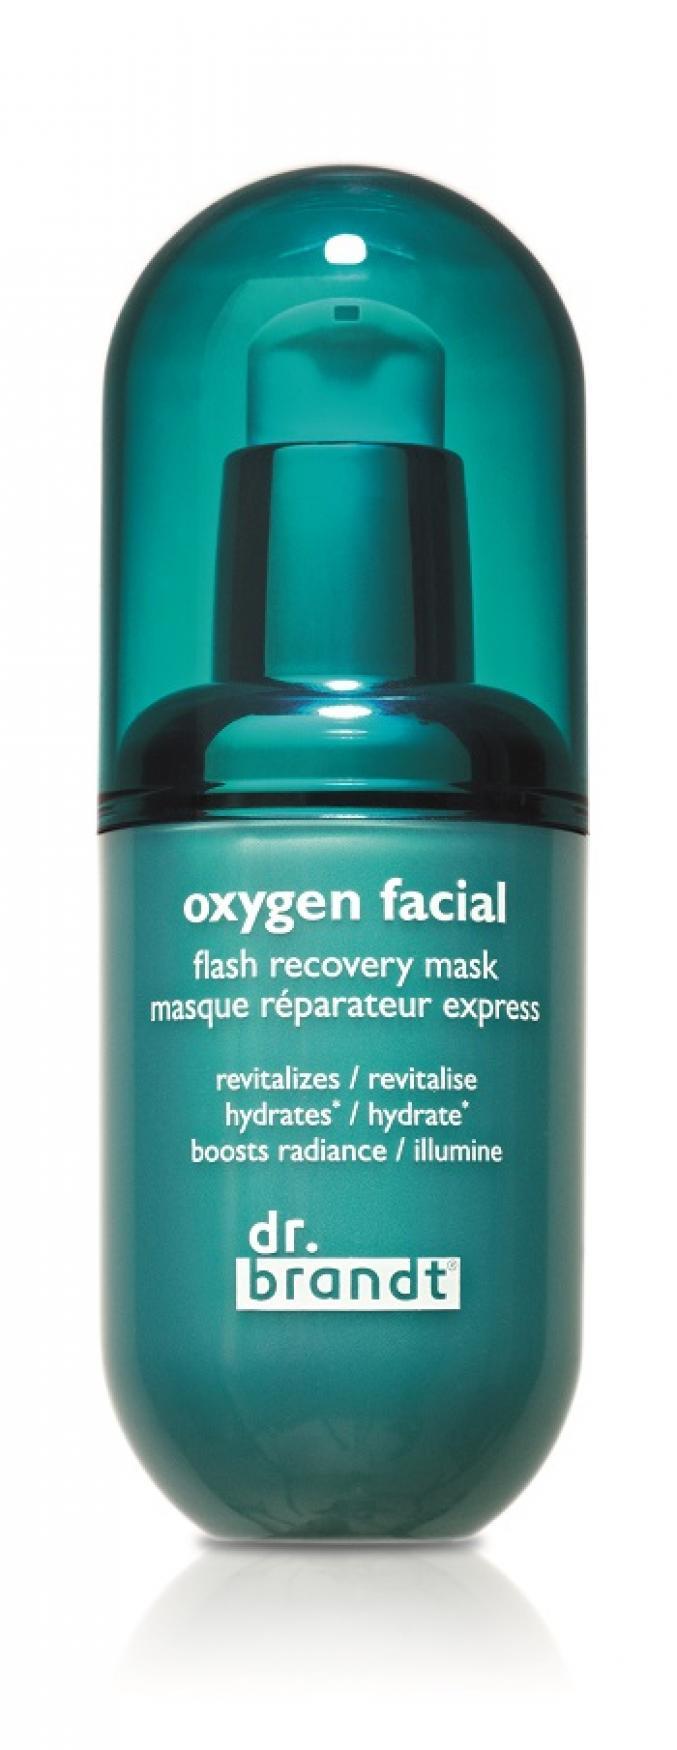 Oxygen facial (Dr Brandt)